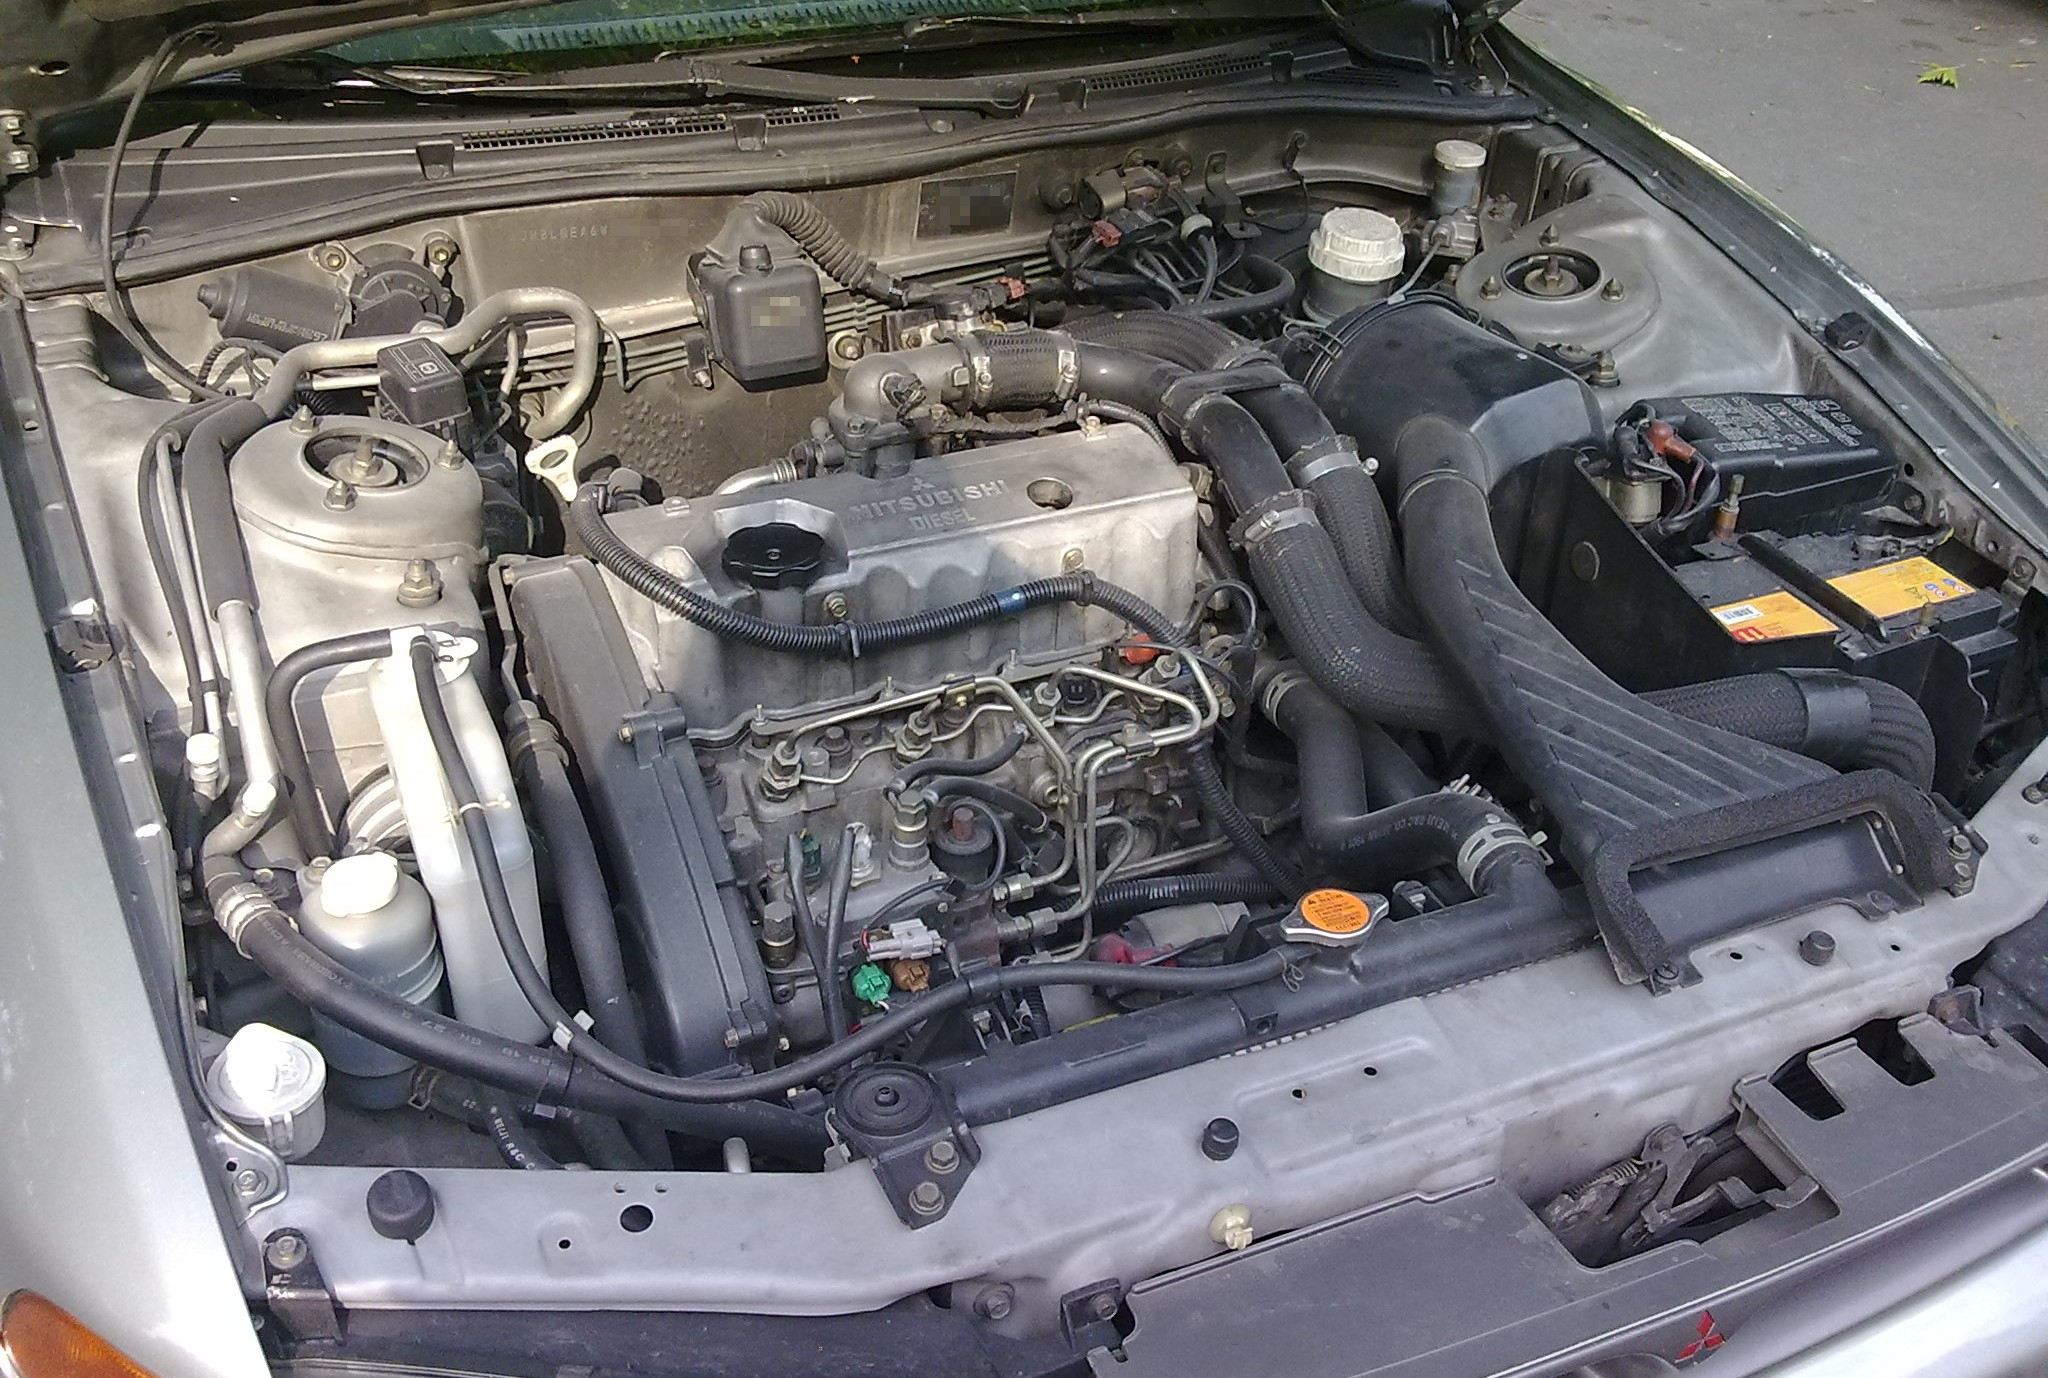 2000 Mitsubishi Galant Engine Diagram Mitsubishi Galant 1 8 1997 Of 2000 Mitsubishi Galant Engine Diagram